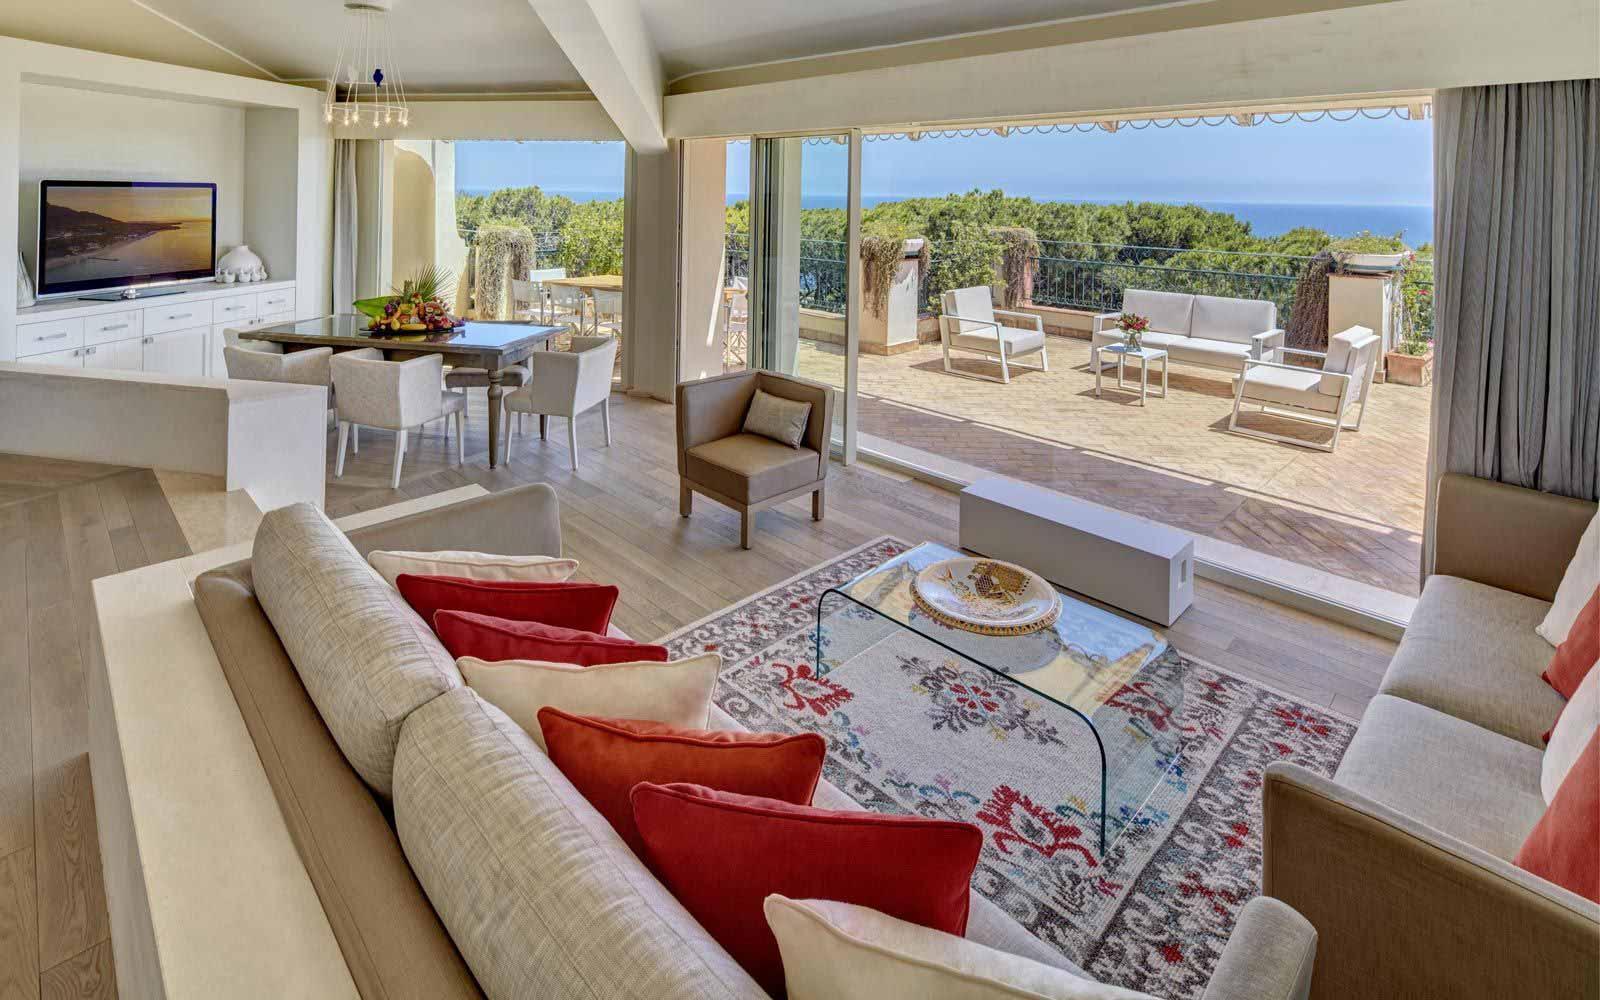 Hotel Castello Imperial Suite living room at Forte Village Resort